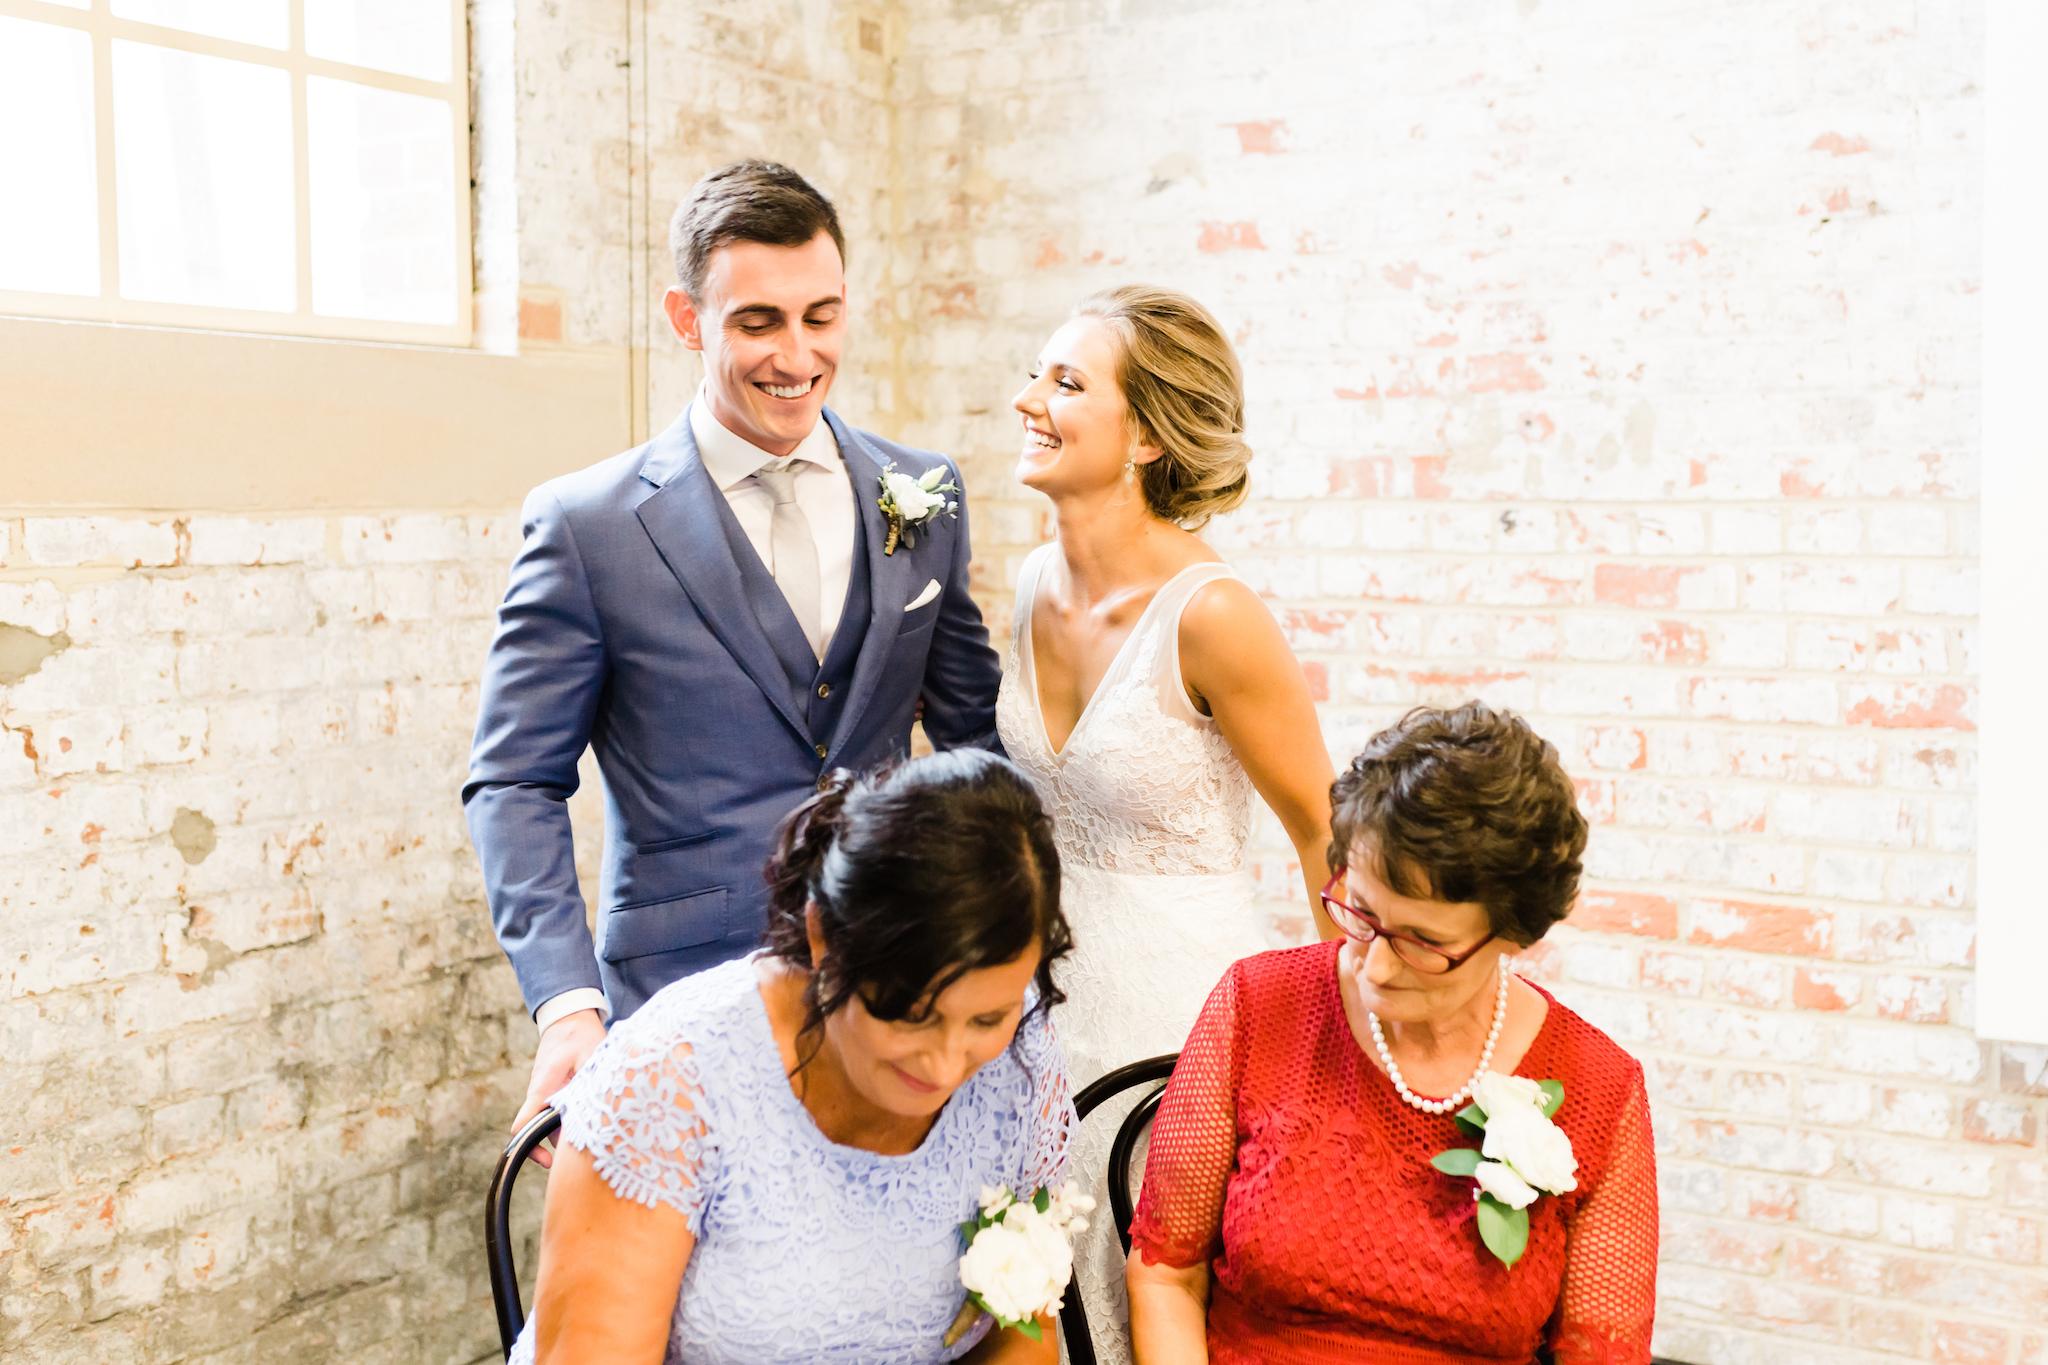 343-SOPHIE  DYLAN WEDDING.jpg